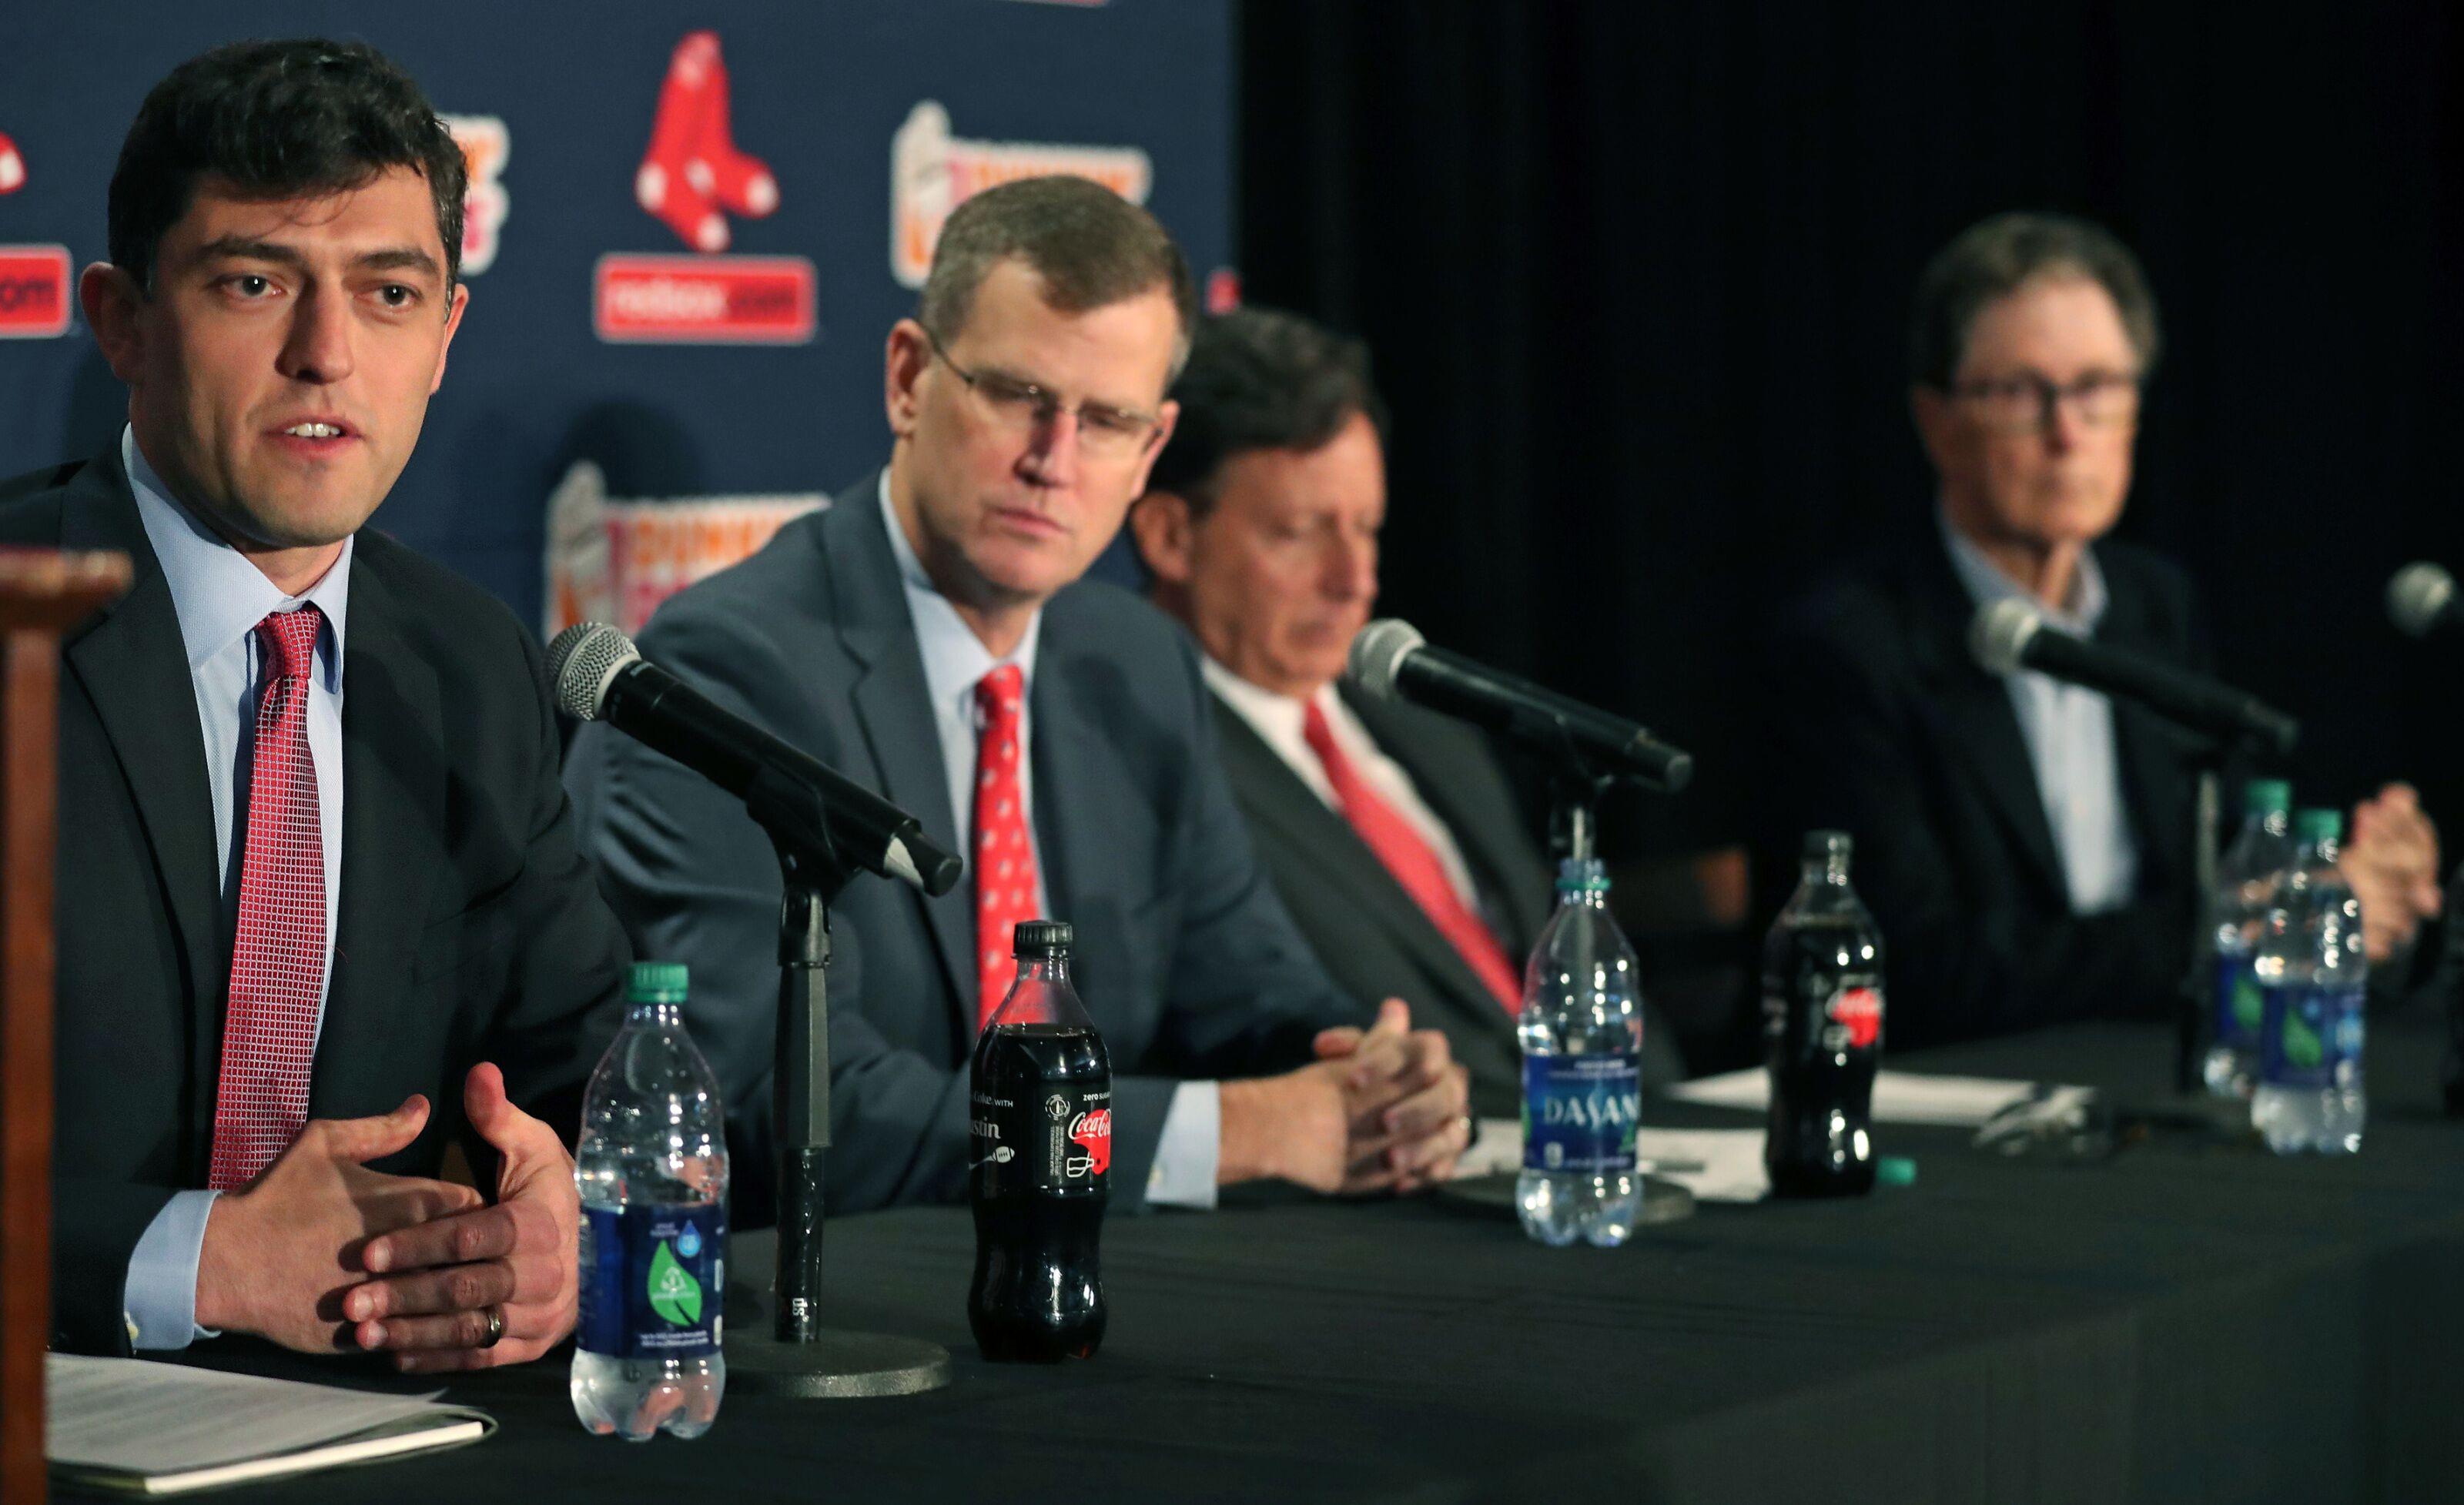 Boston Red Sox: Understanding who's running my team